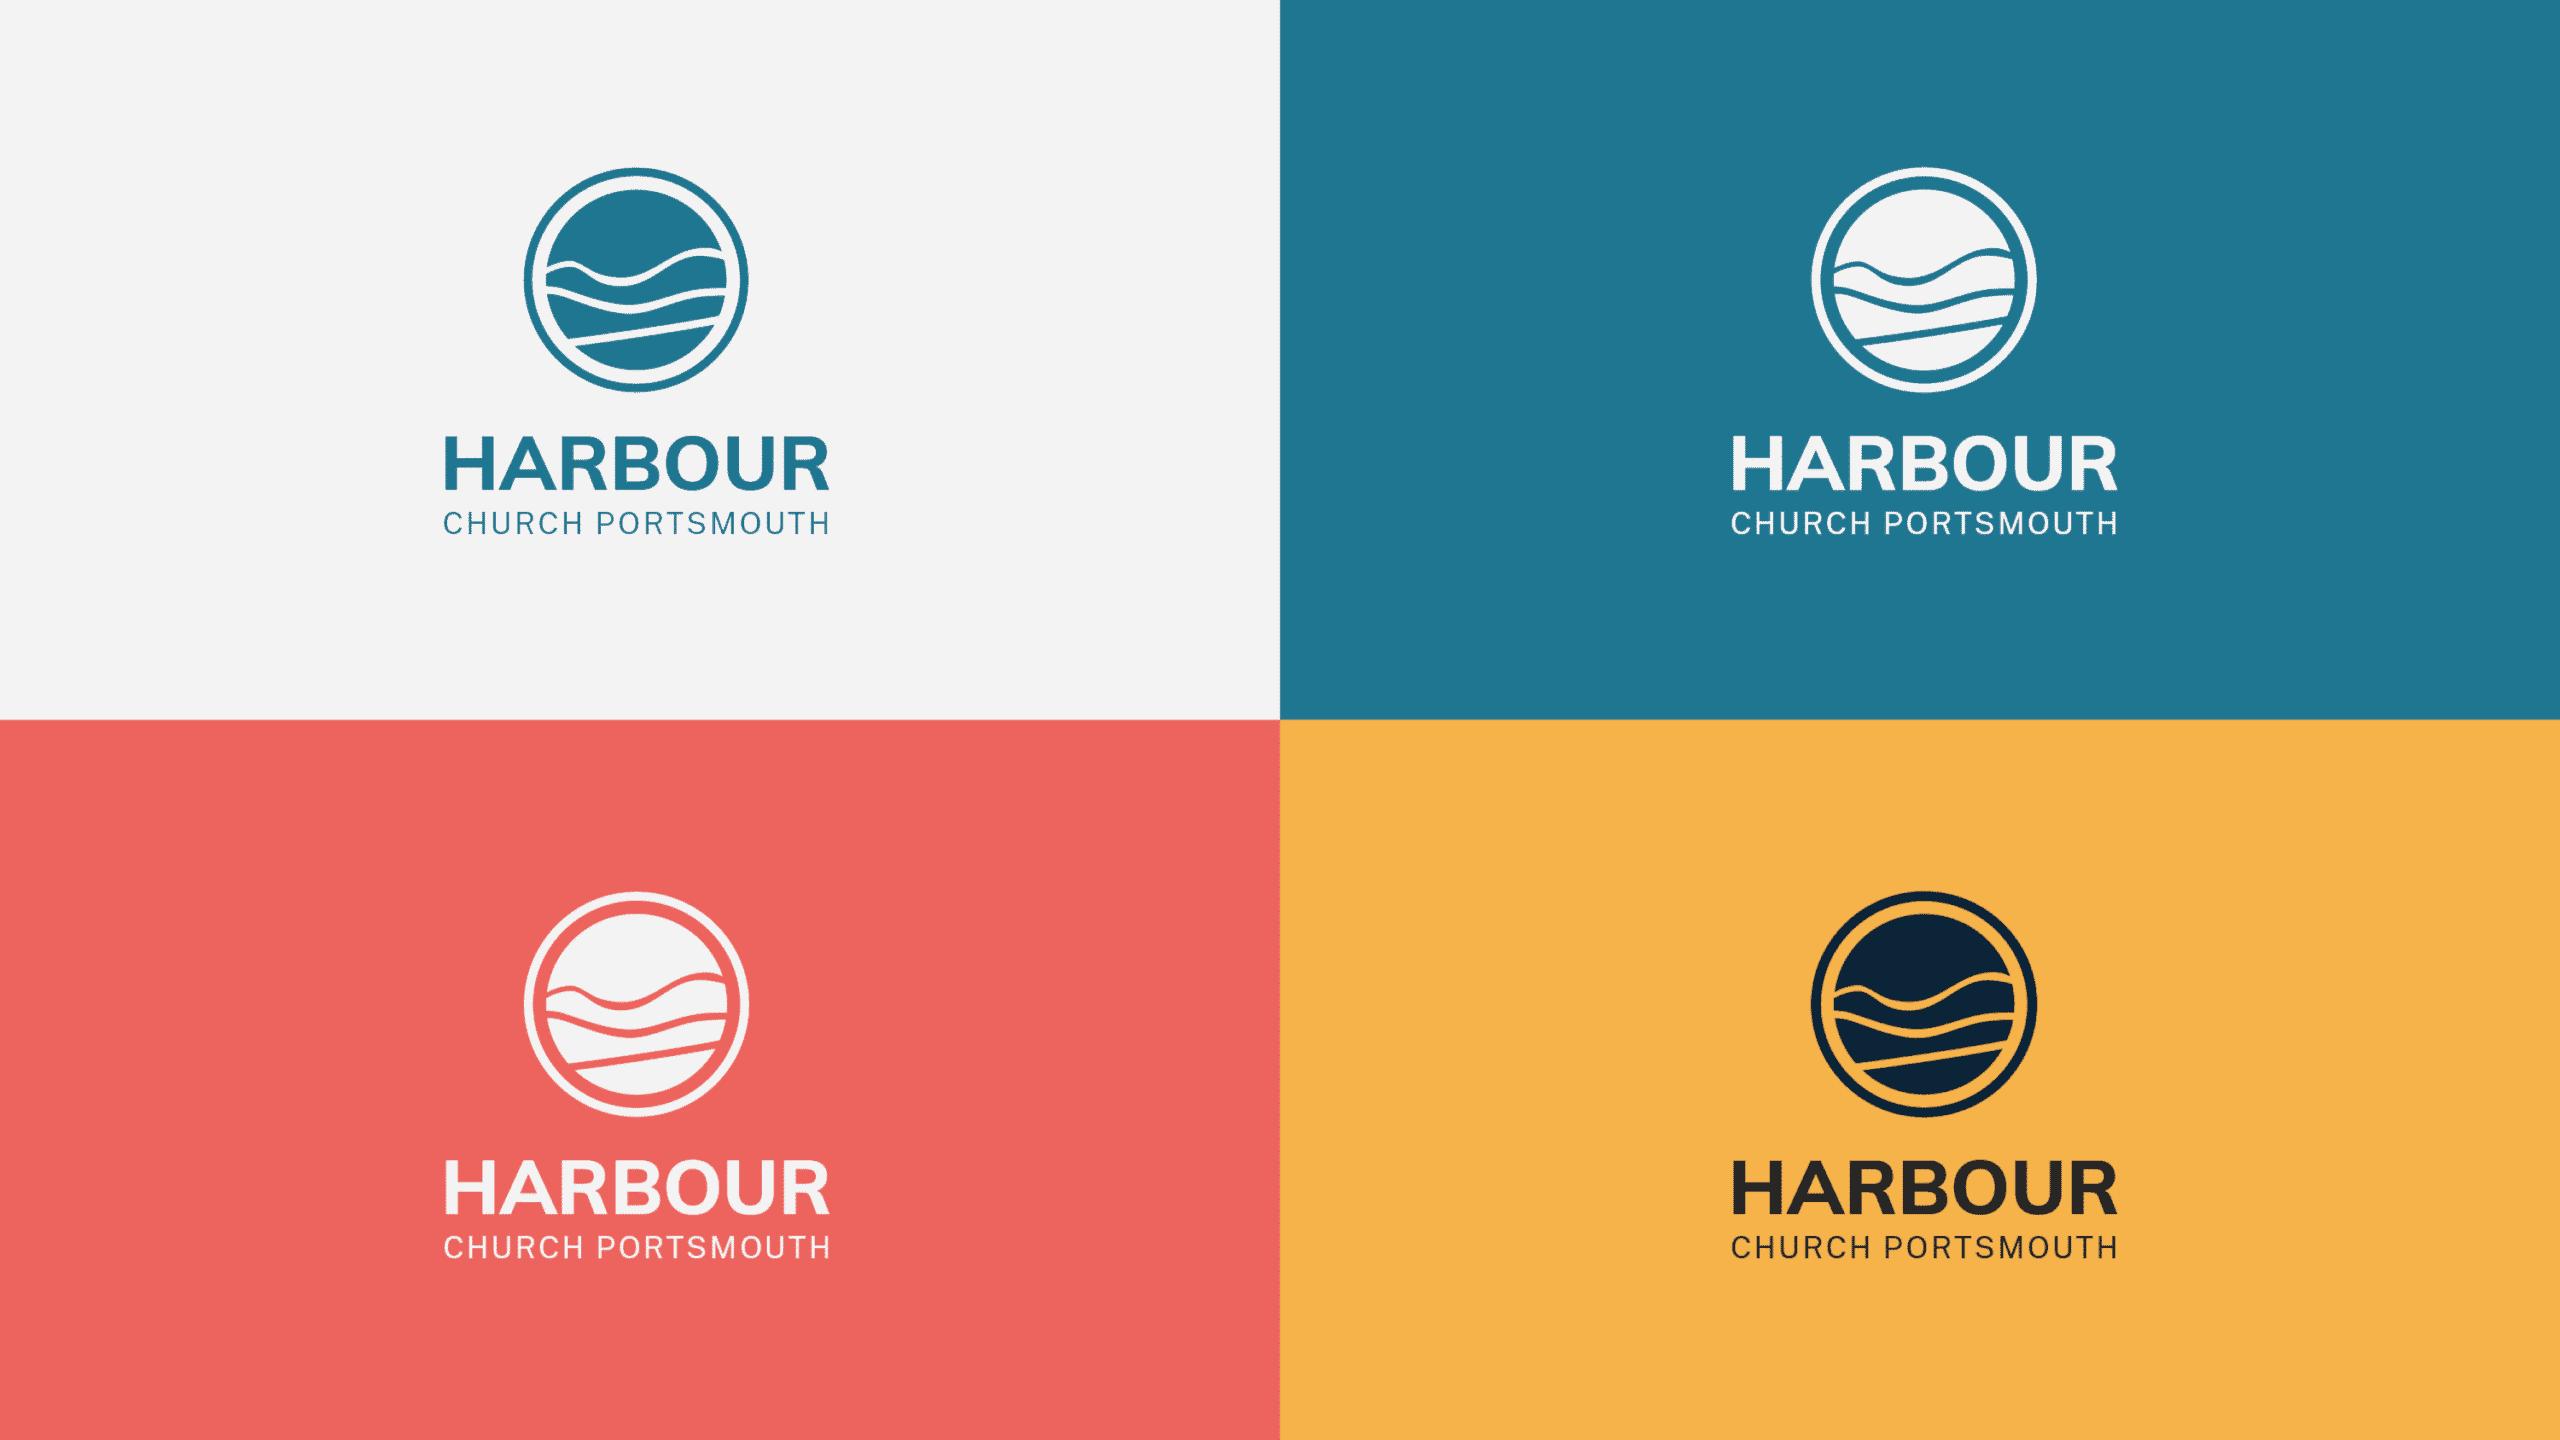 Harbour Church Portsmouth final logo design display